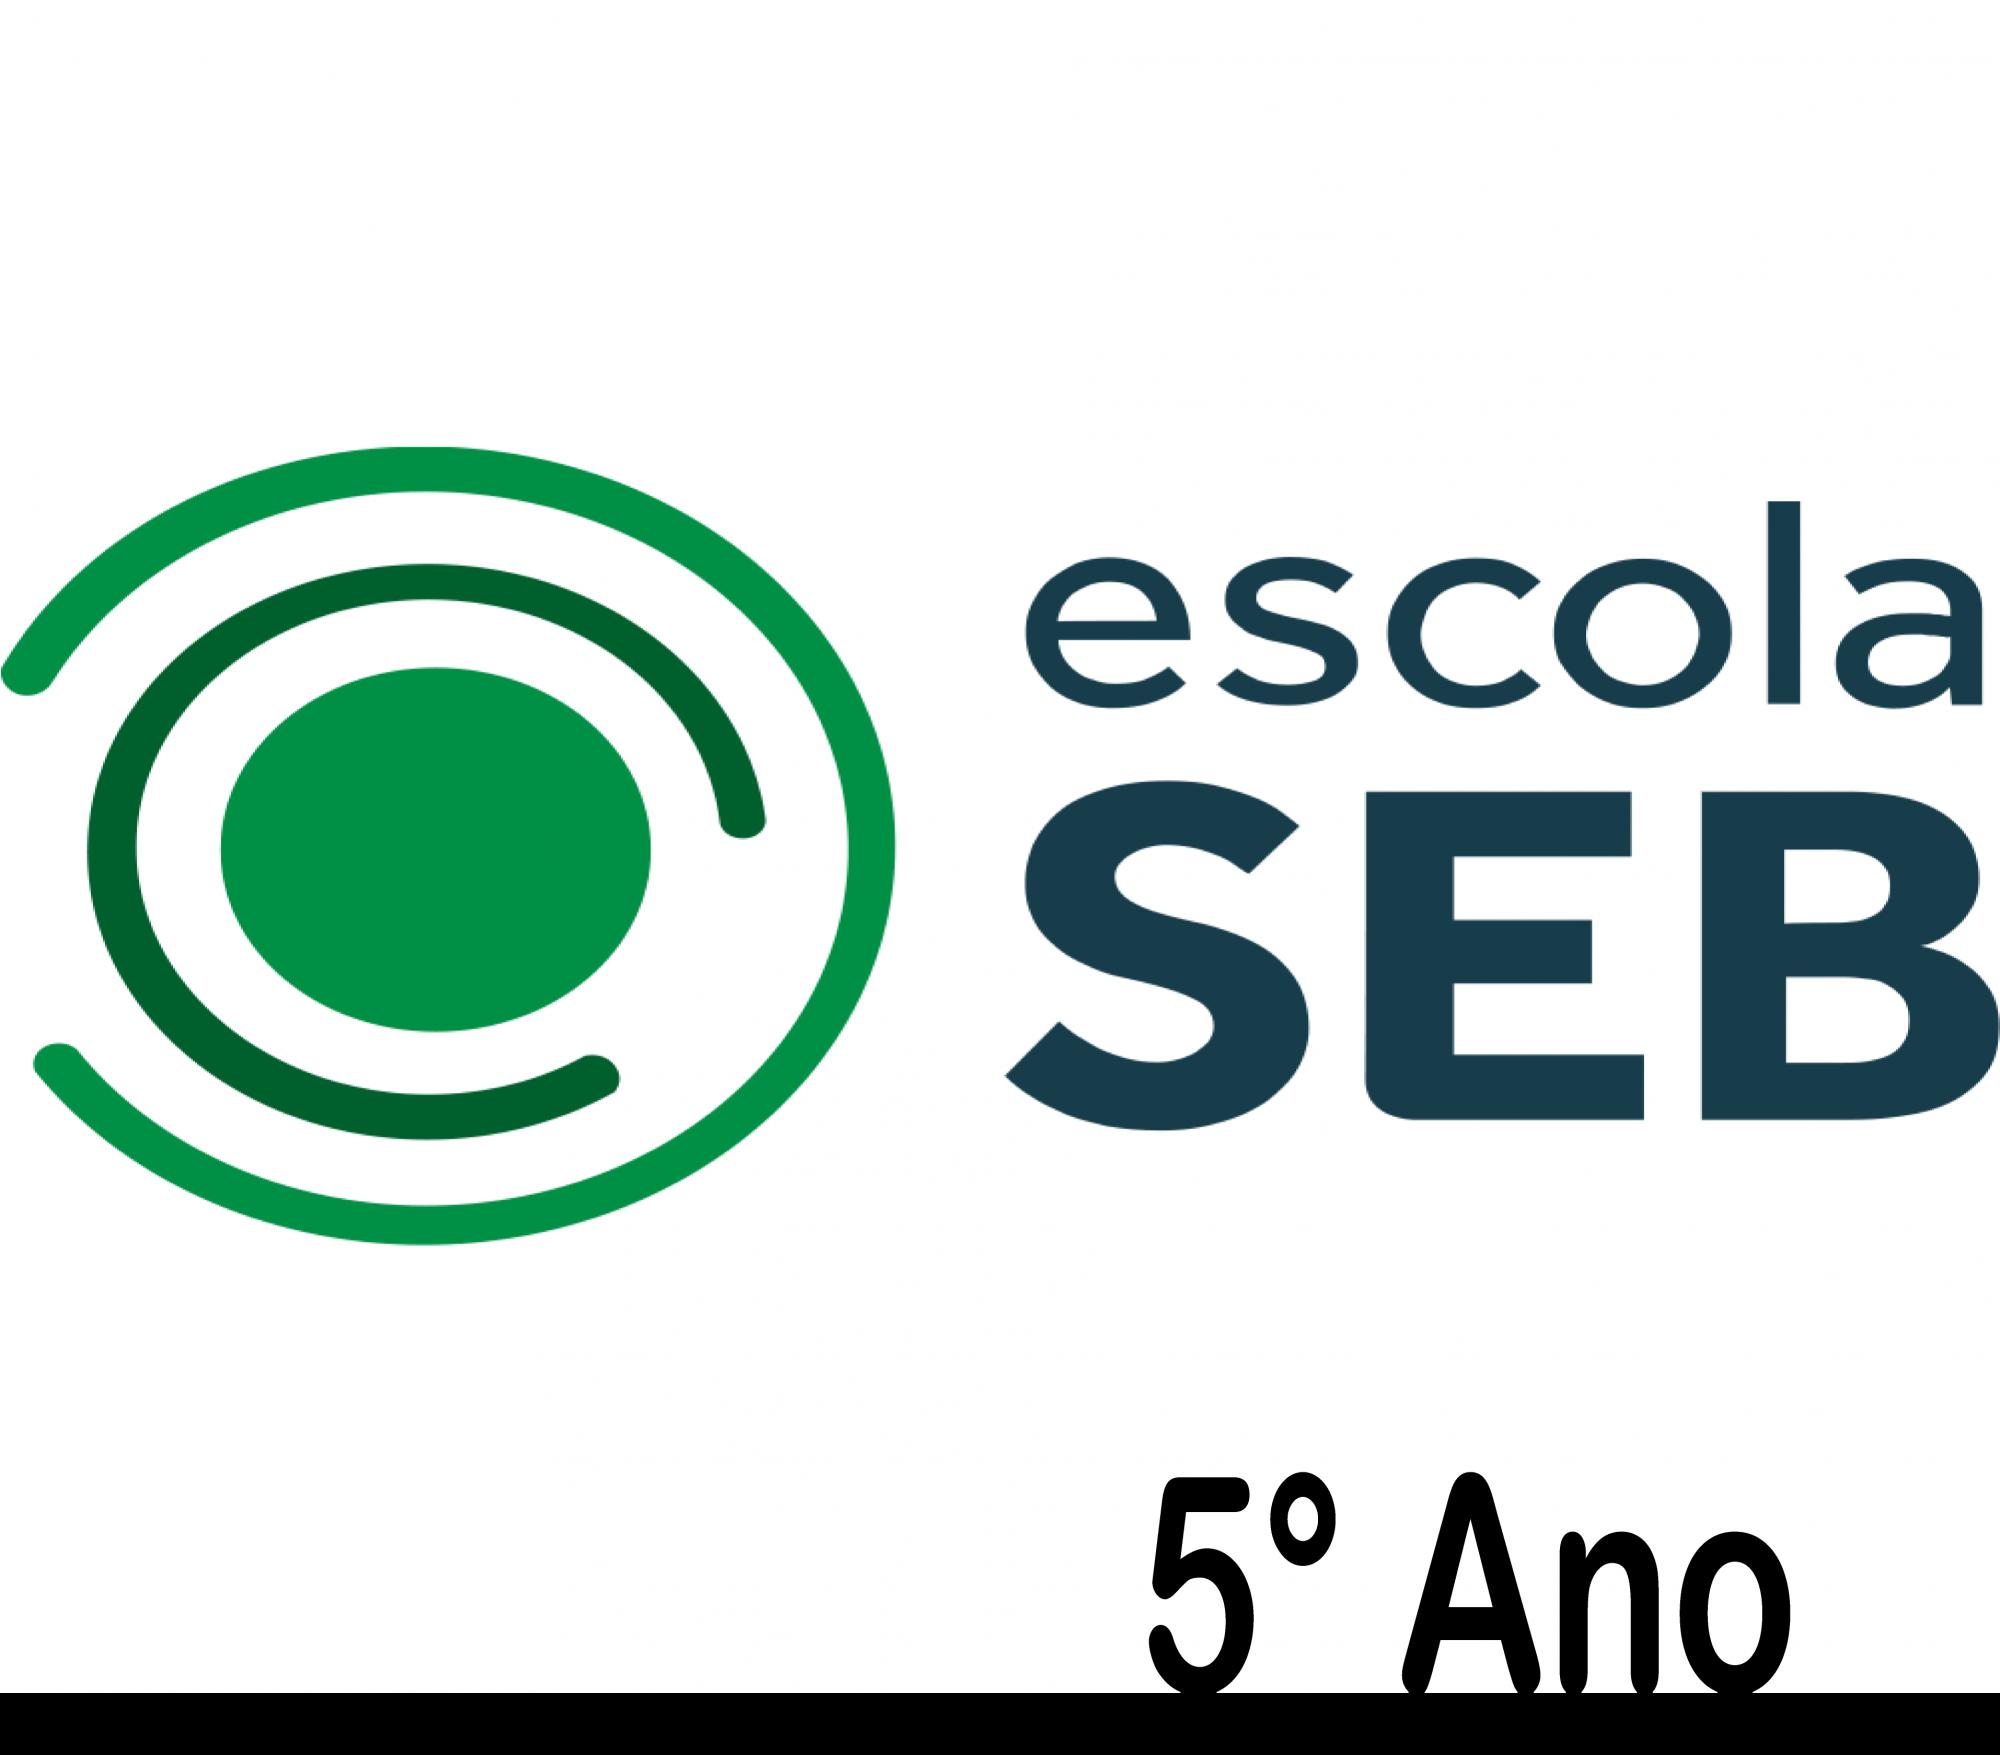 Seb Coc - 5° Ano uso pessoal Faber-Castell - 2021